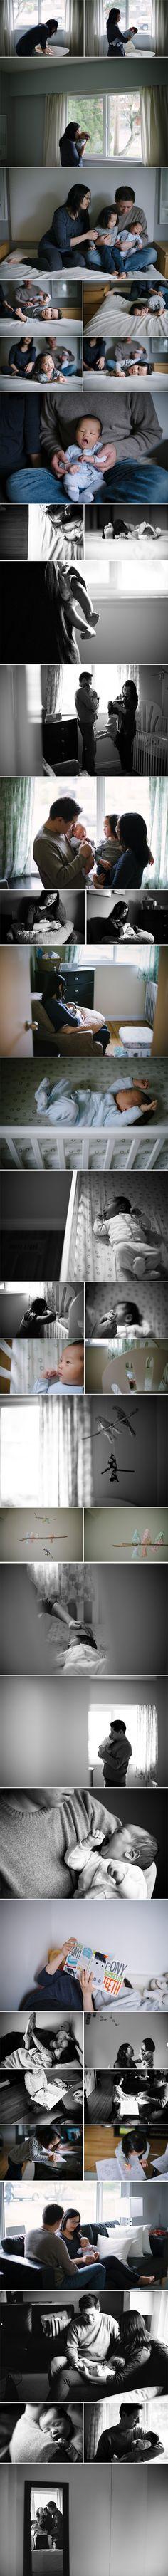 B Life Photography | Jay . 3 weeks. Vancouver Newborn Photography.